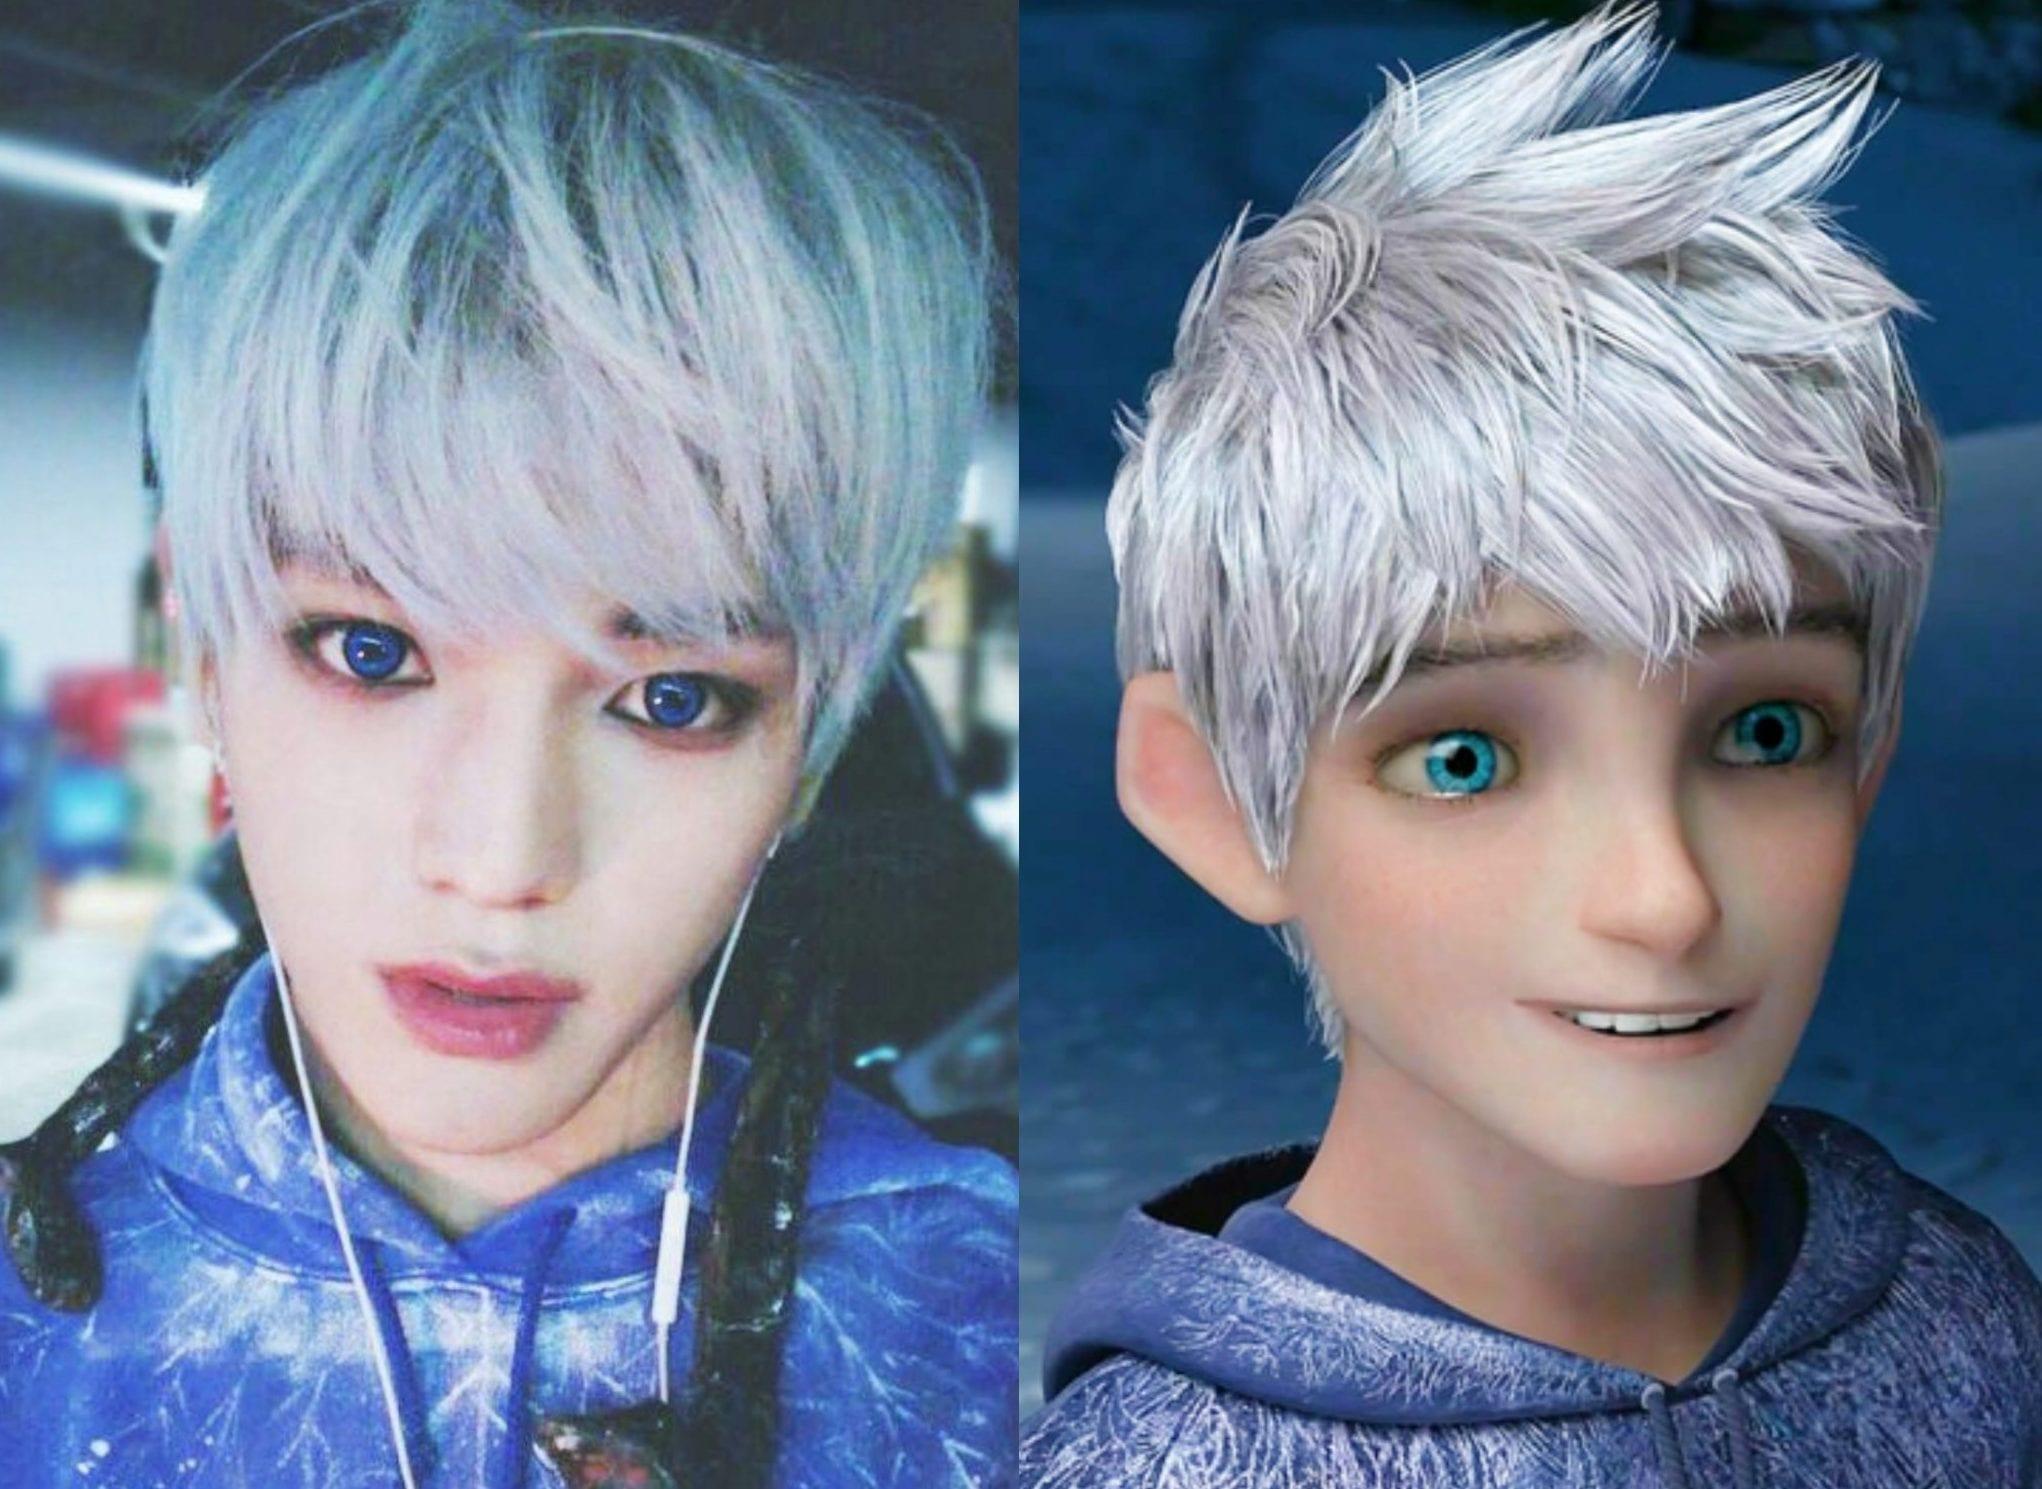 10 More Times K-pop Idols Rocked Their Halloween Costumes